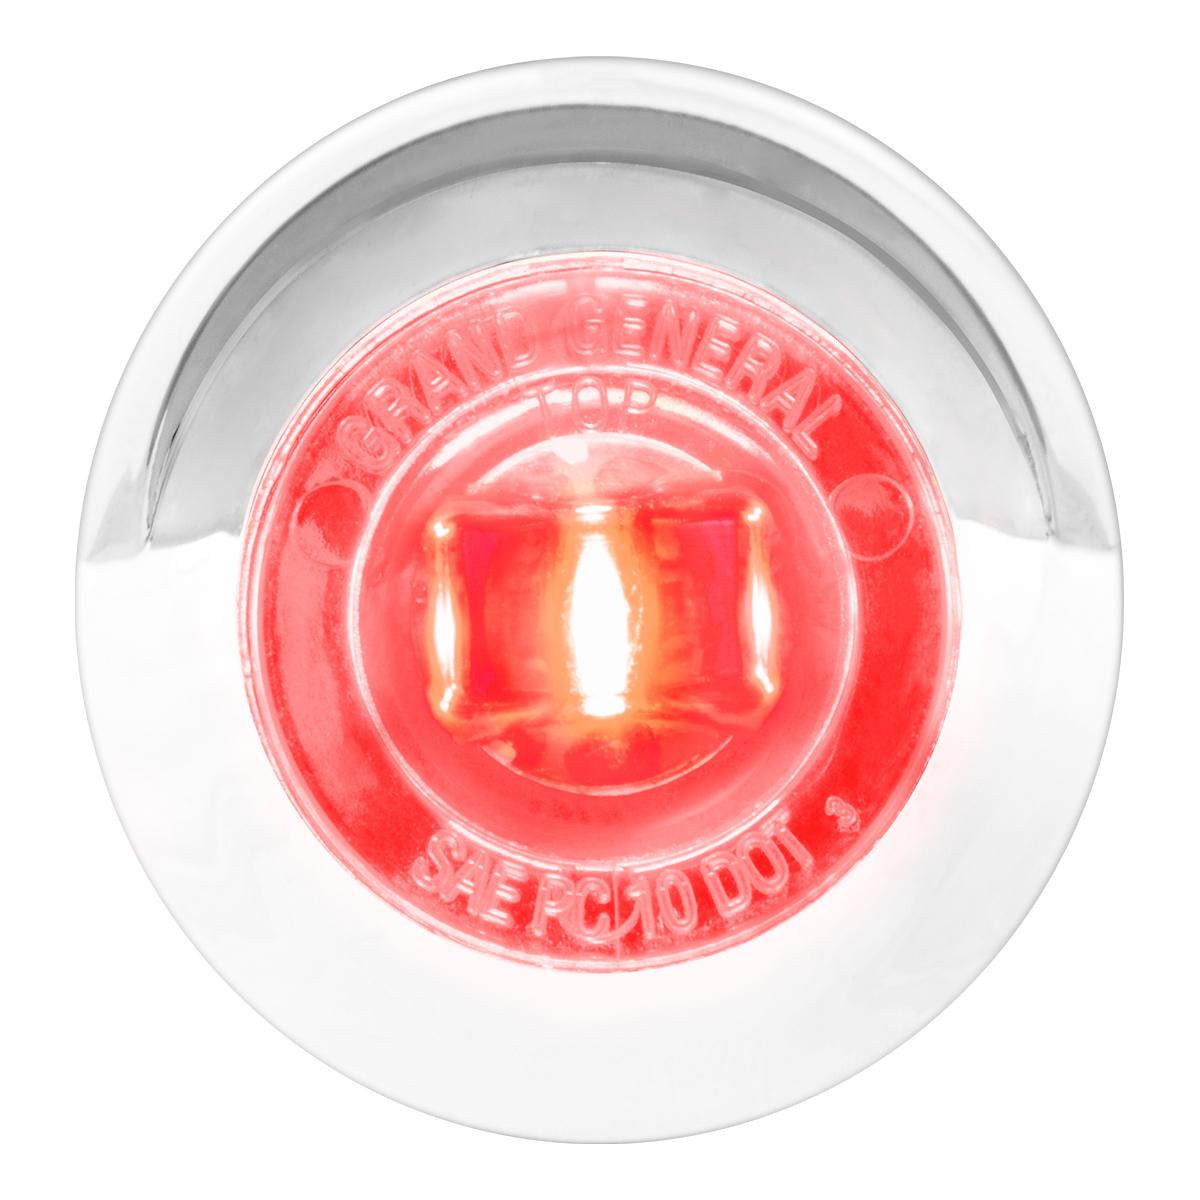 "75263 1"" Dual Function Mini Push/Screw-in Wide Angle LED Light w/ Chrome Bezel & Visor"